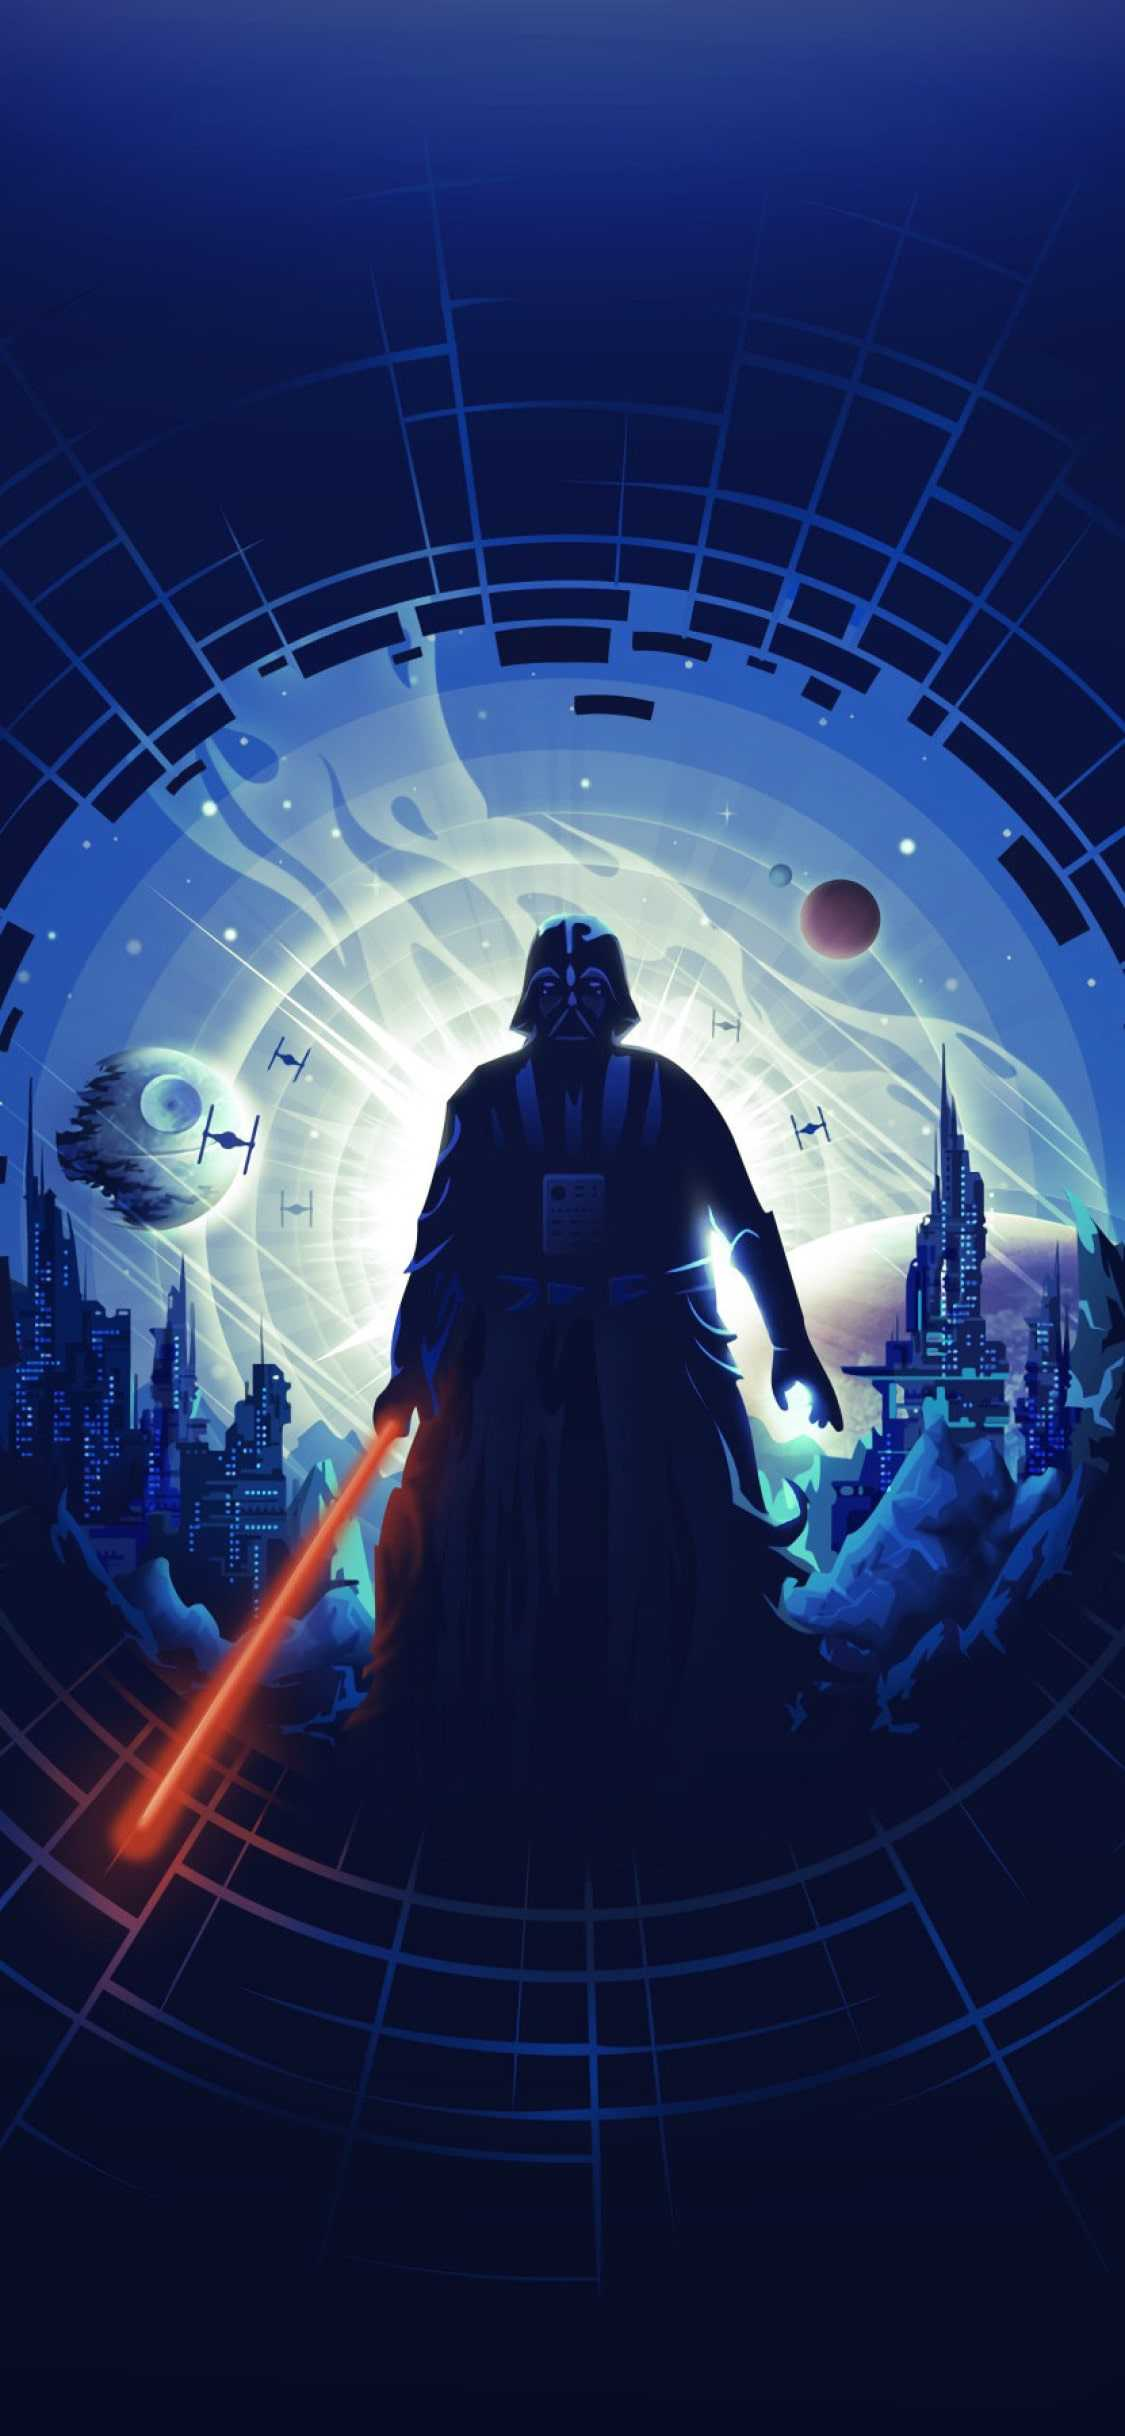 Star Wars Iphone Wallpaper Nawpic